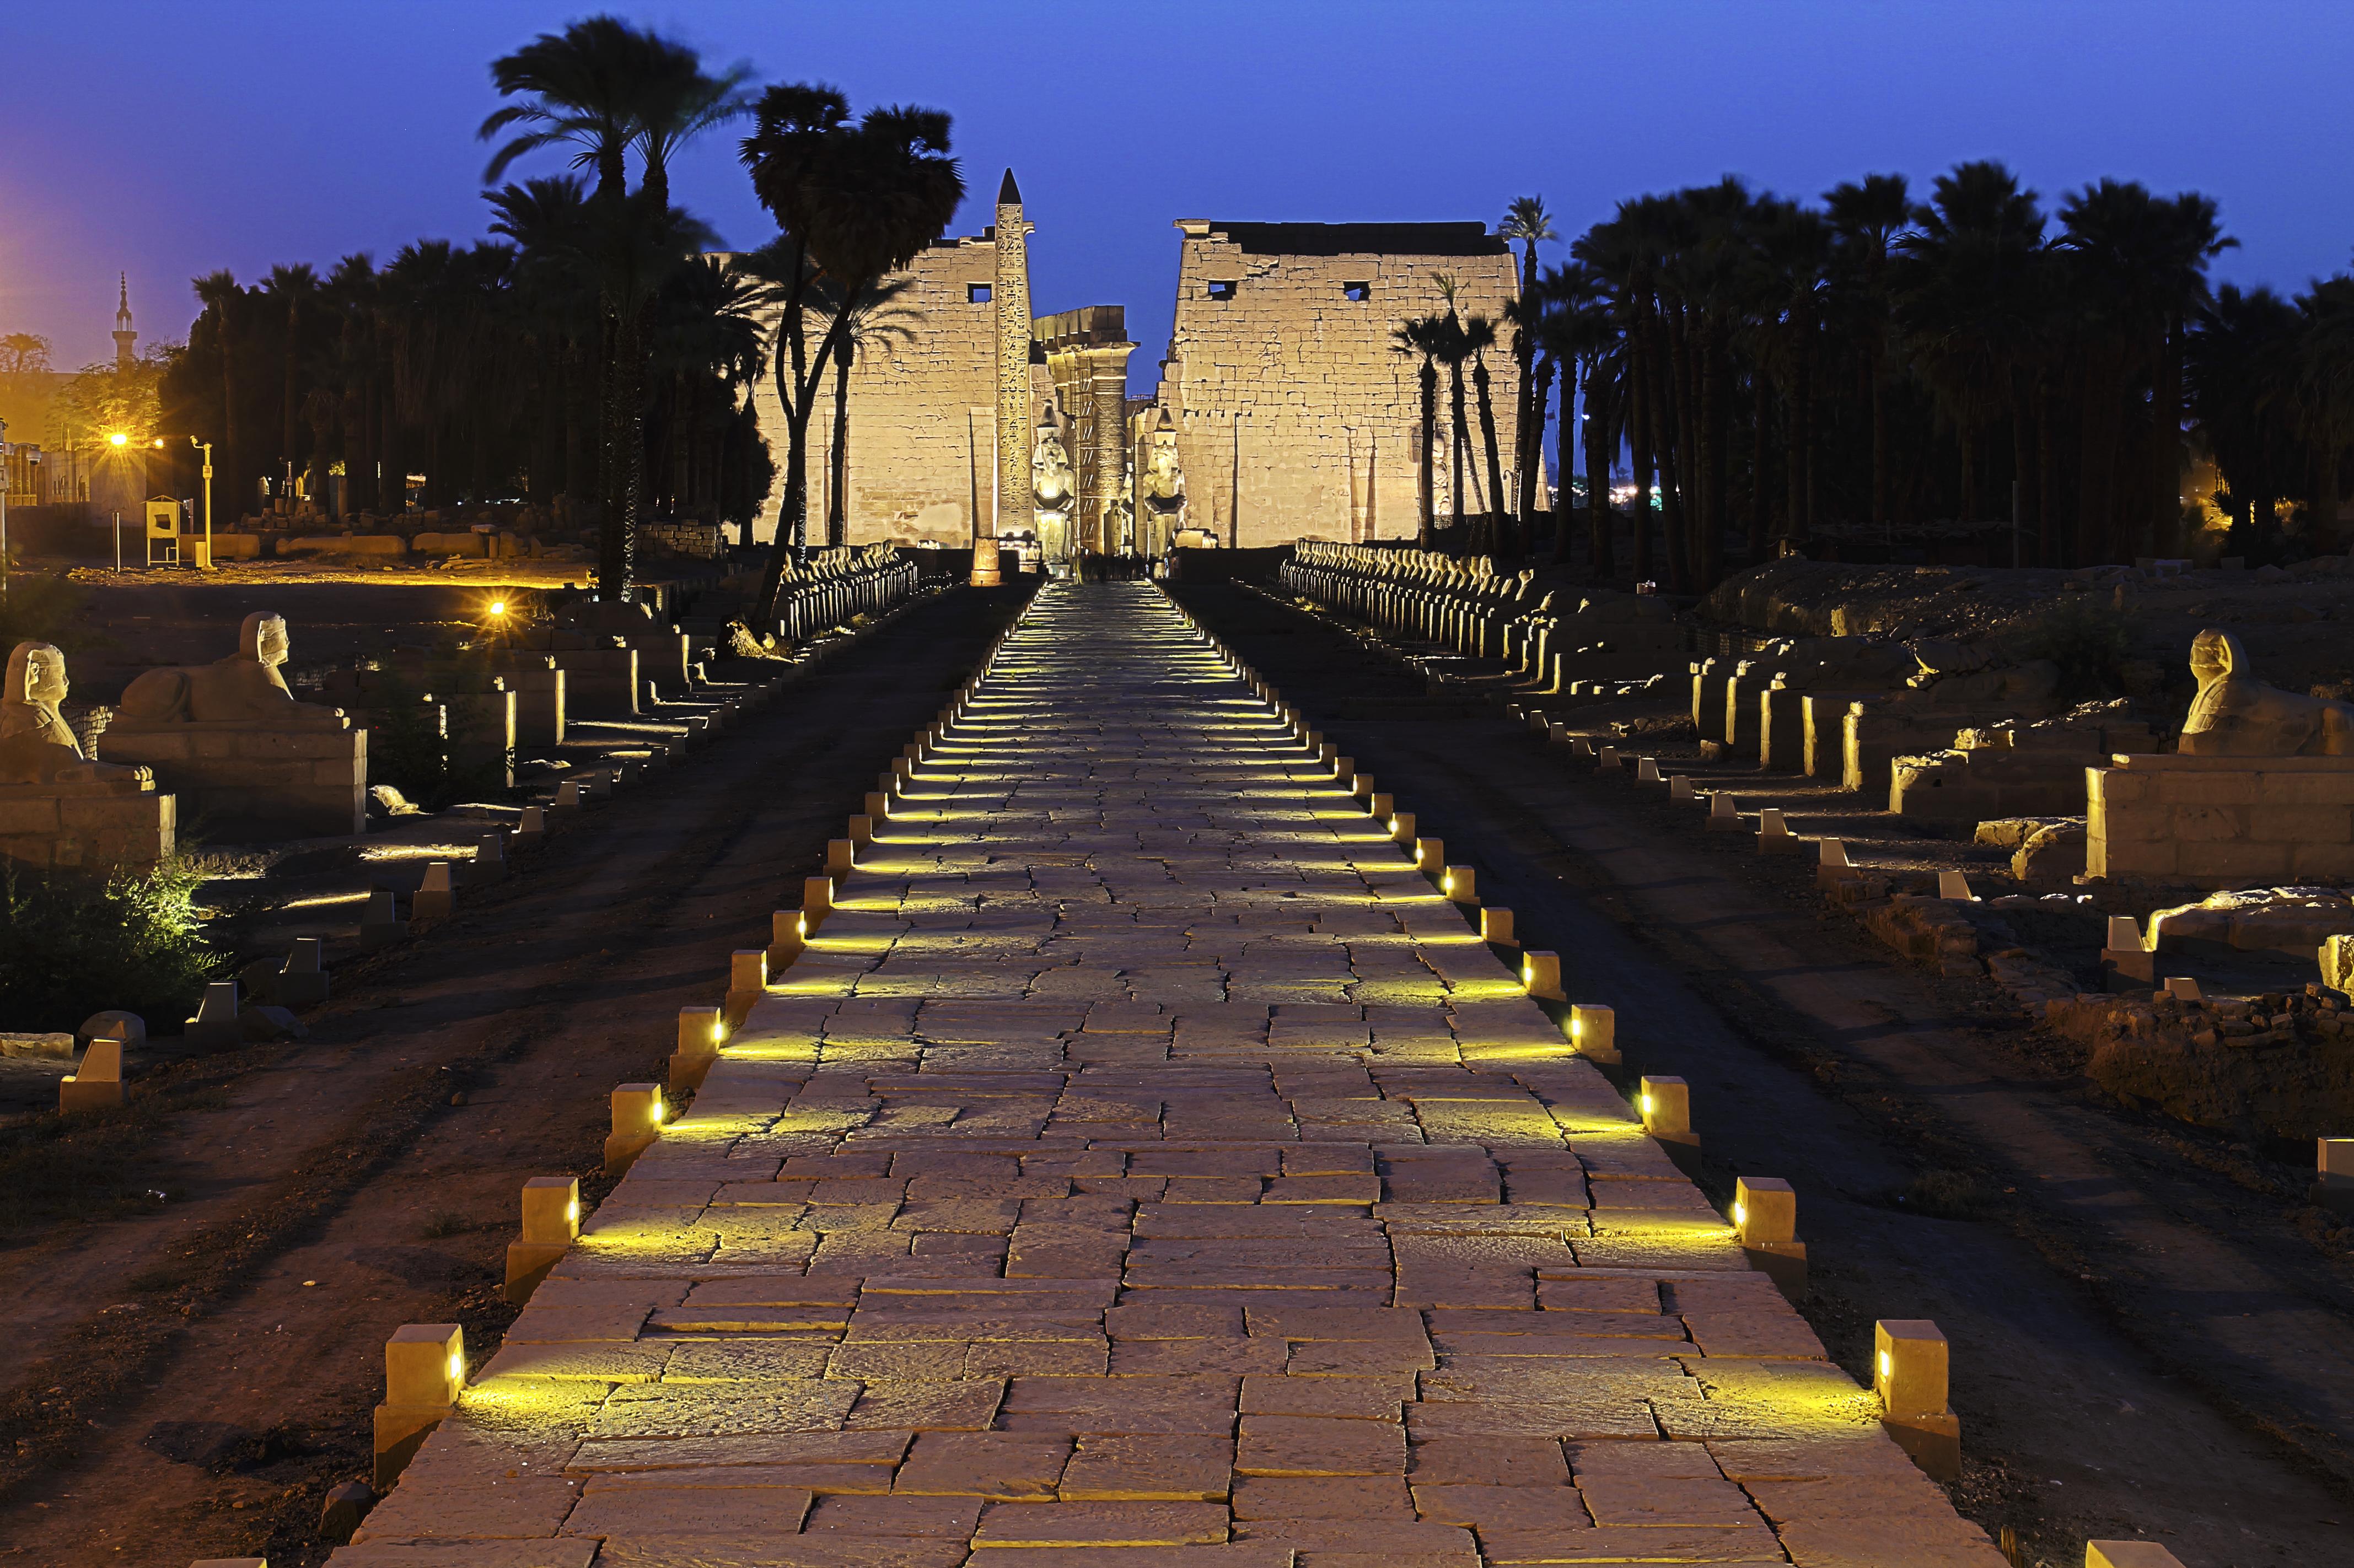 Luxor Temple 2015 - أشهر الاماكن السياحية فى الأقصر